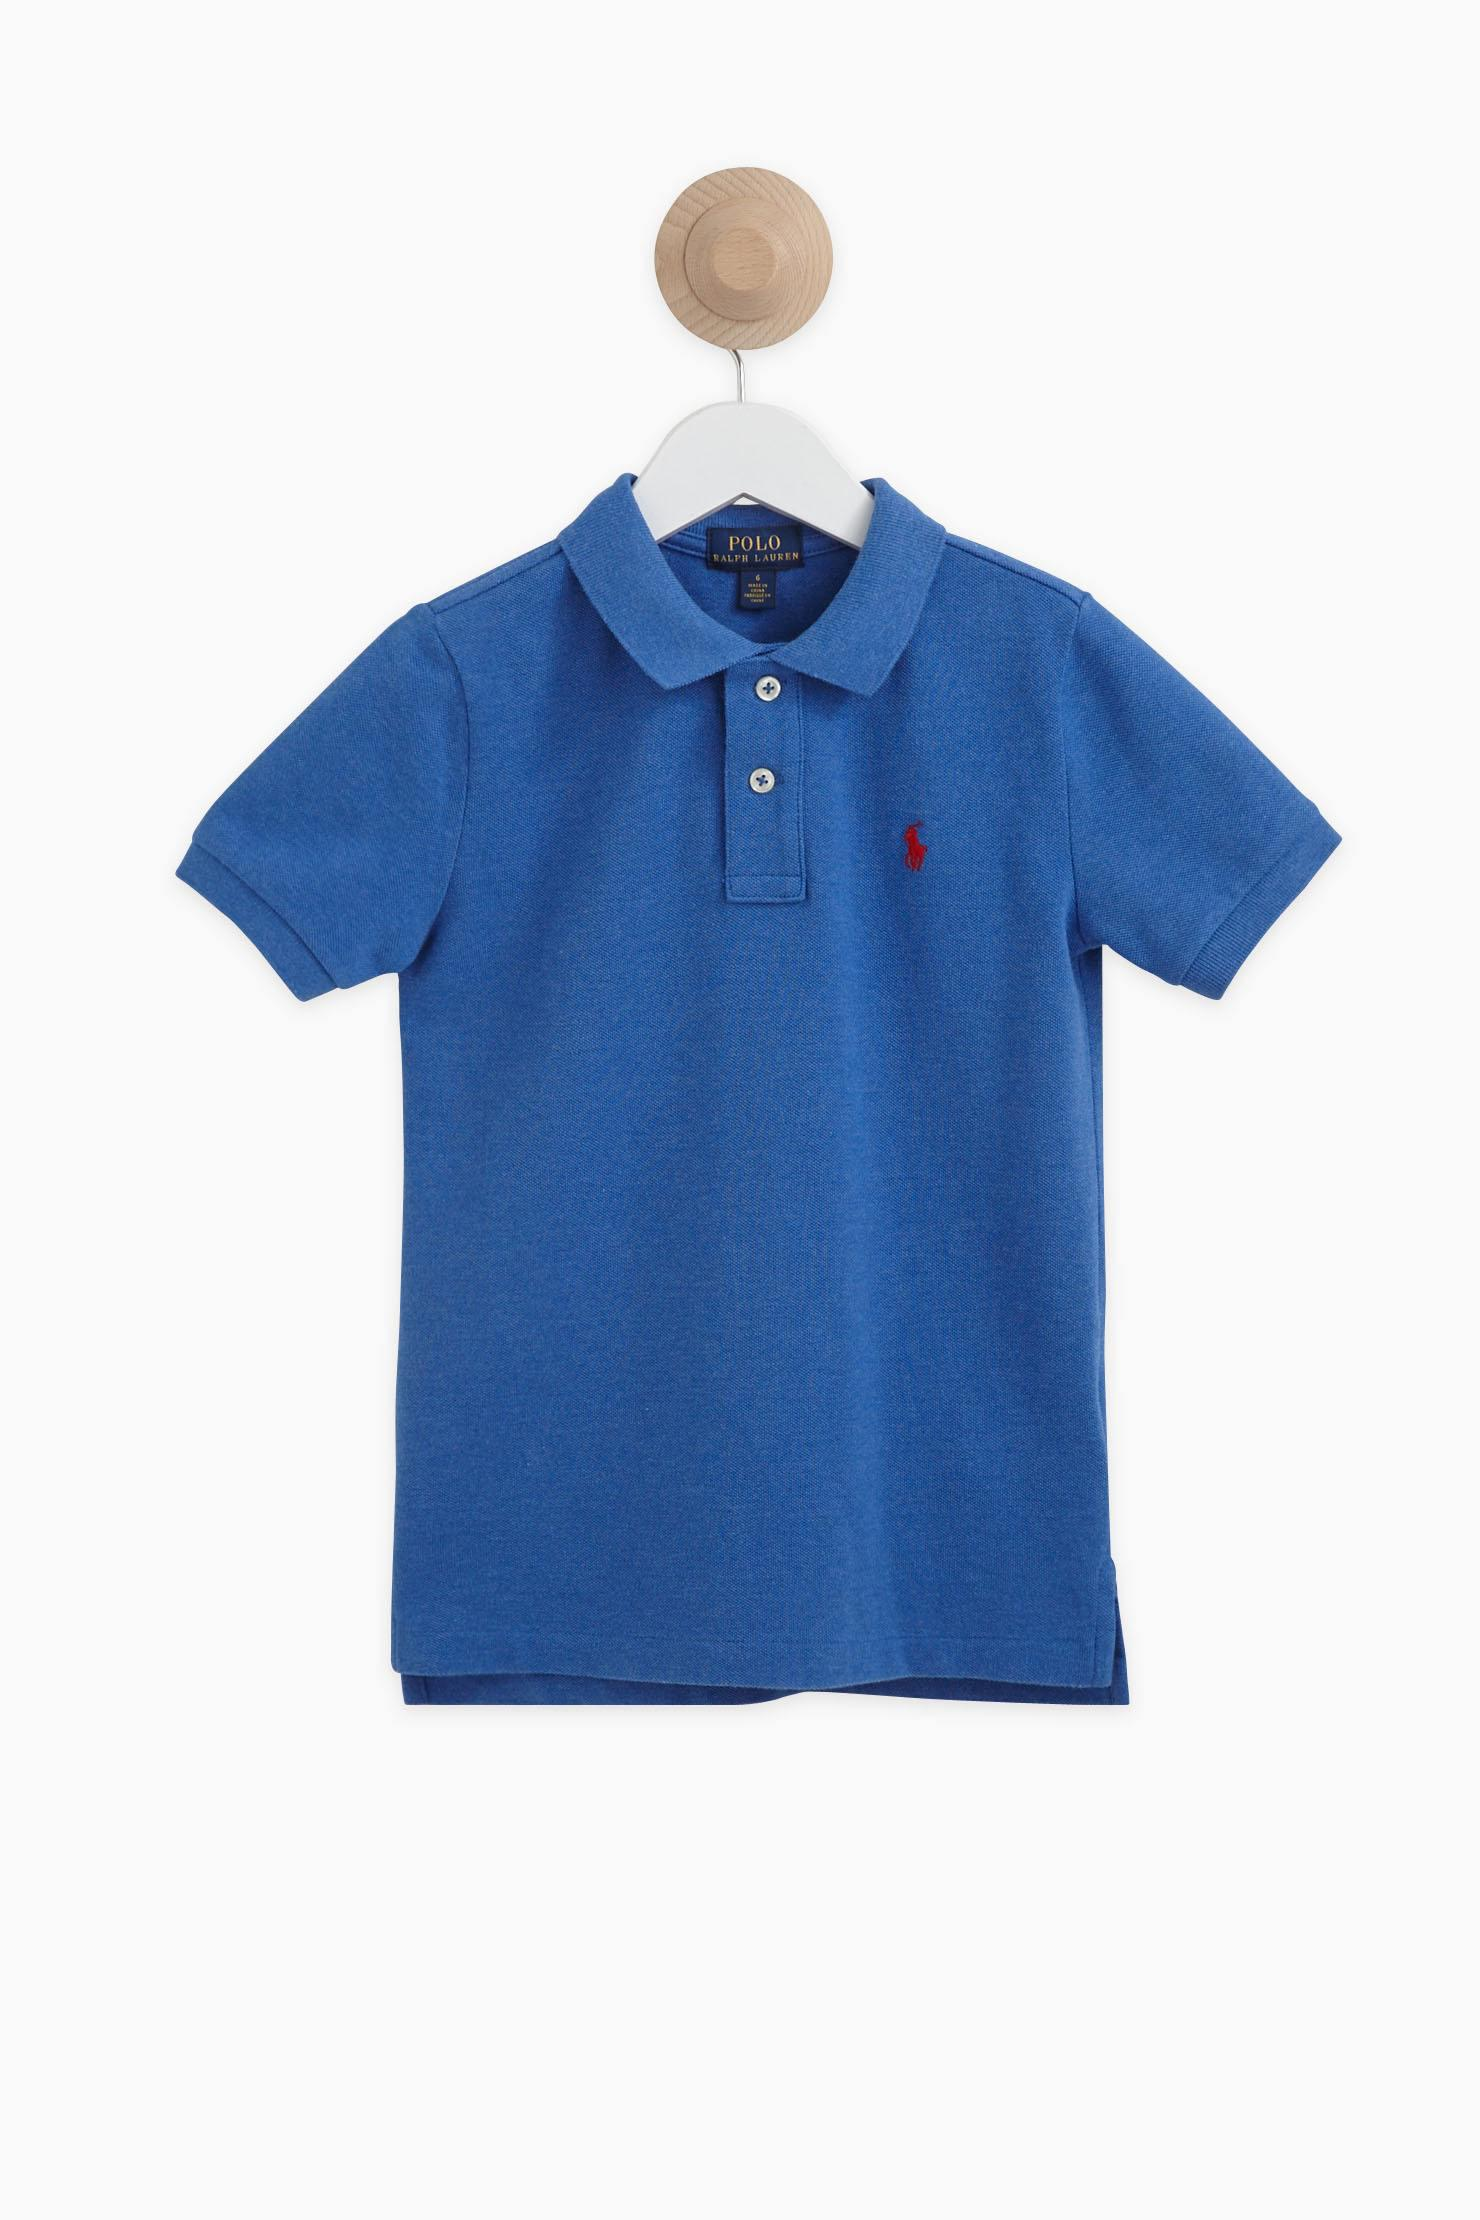 lyst polo ralph lauren t shirt polo shirt in blue for men. Black Bedroom Furniture Sets. Home Design Ideas